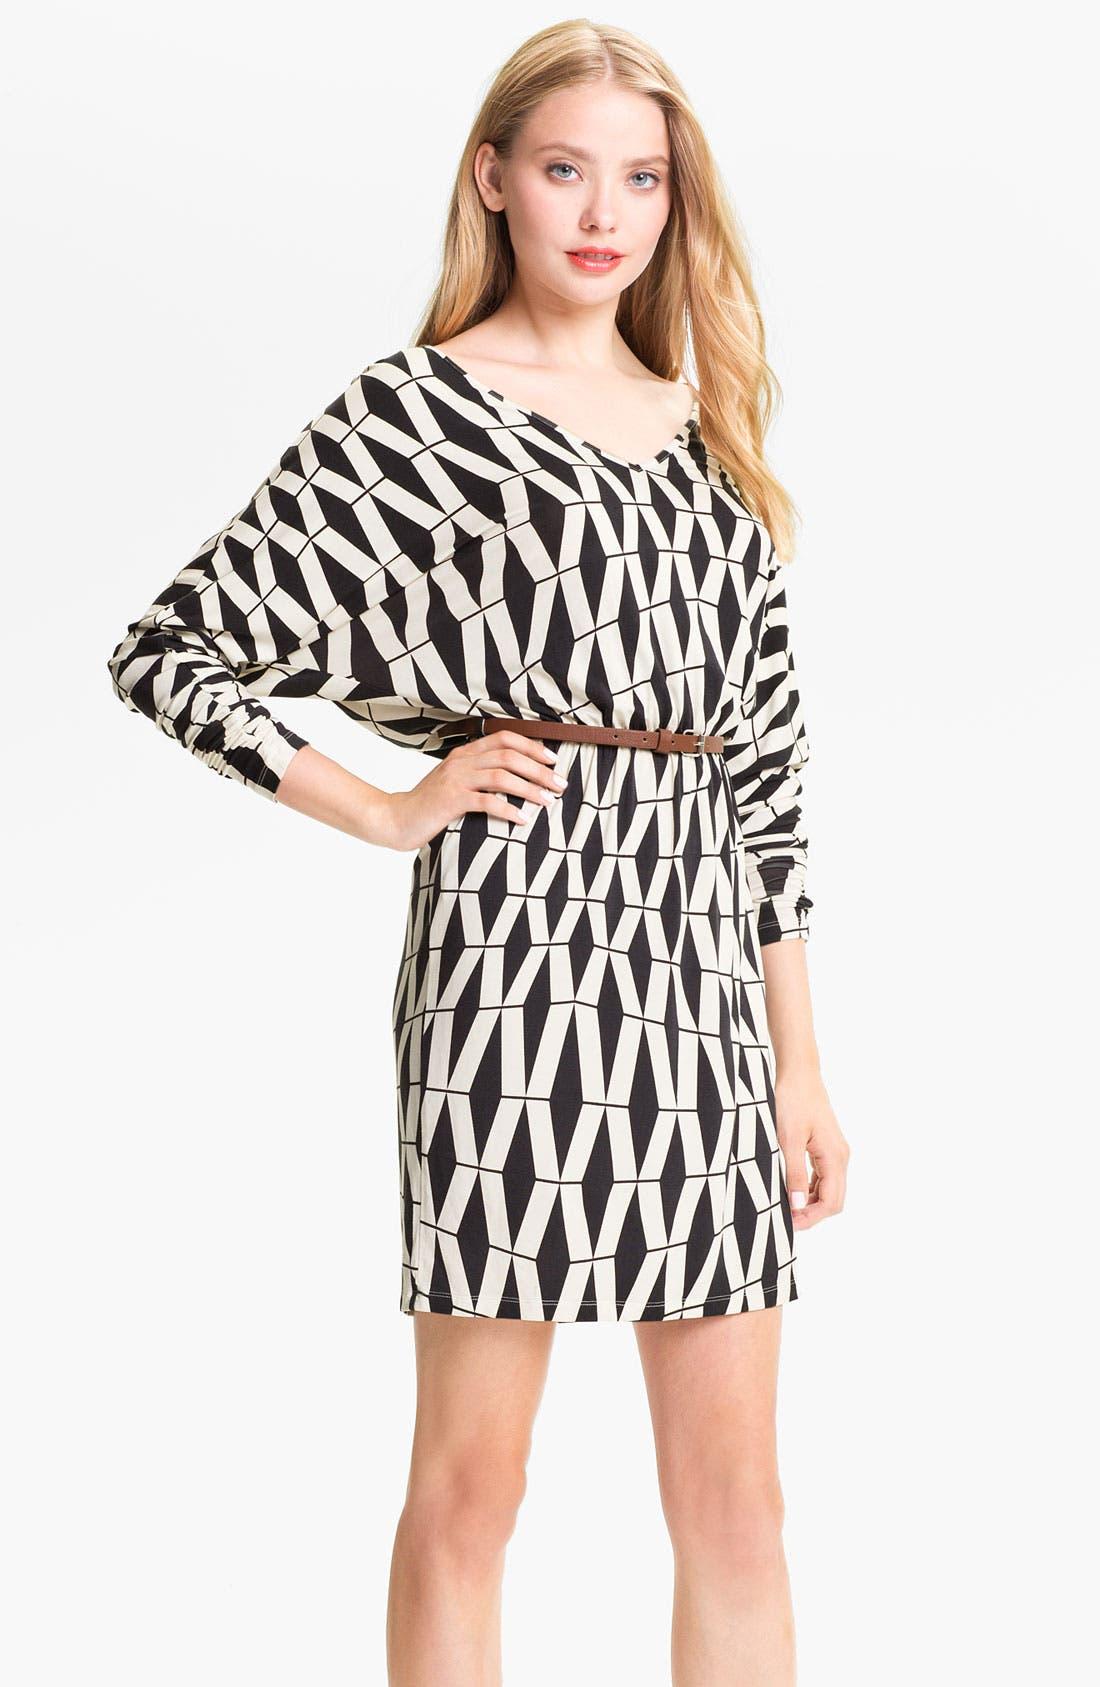 Alternate Image 1 Selected - Tart 'Liv' Graphic Print Dolman Sleeve Dress